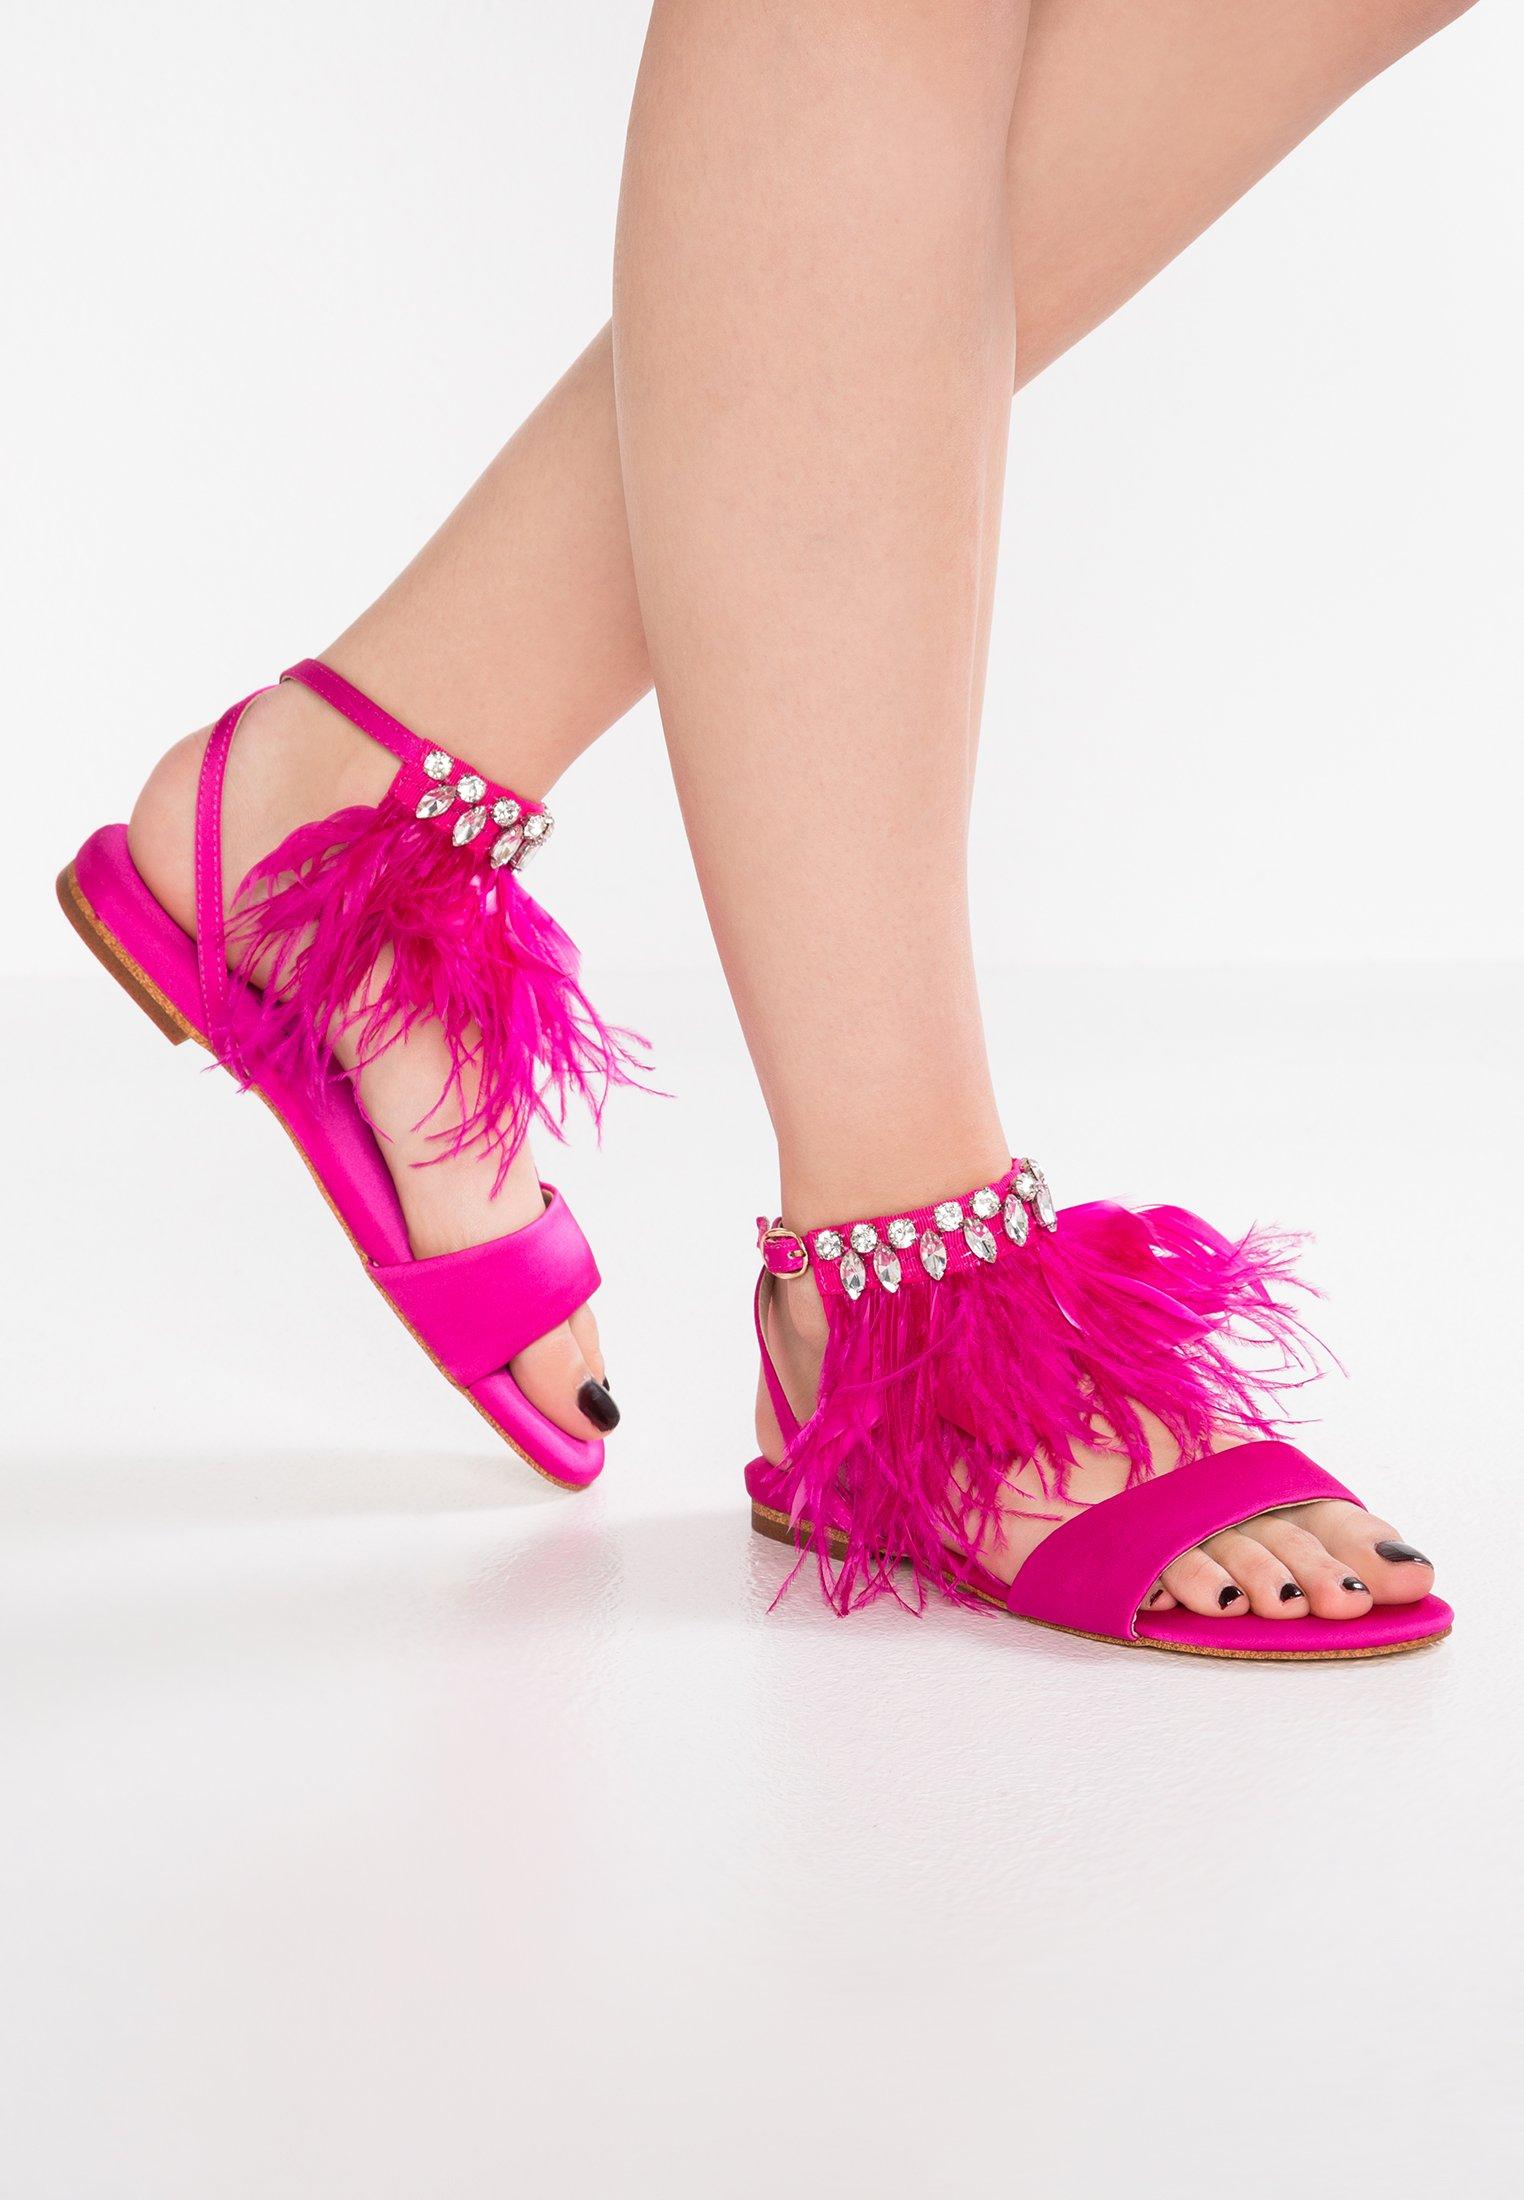 sandali bassi alma en plena - Shoeplay Fashion blog di scarpe da donna f047d1d2048